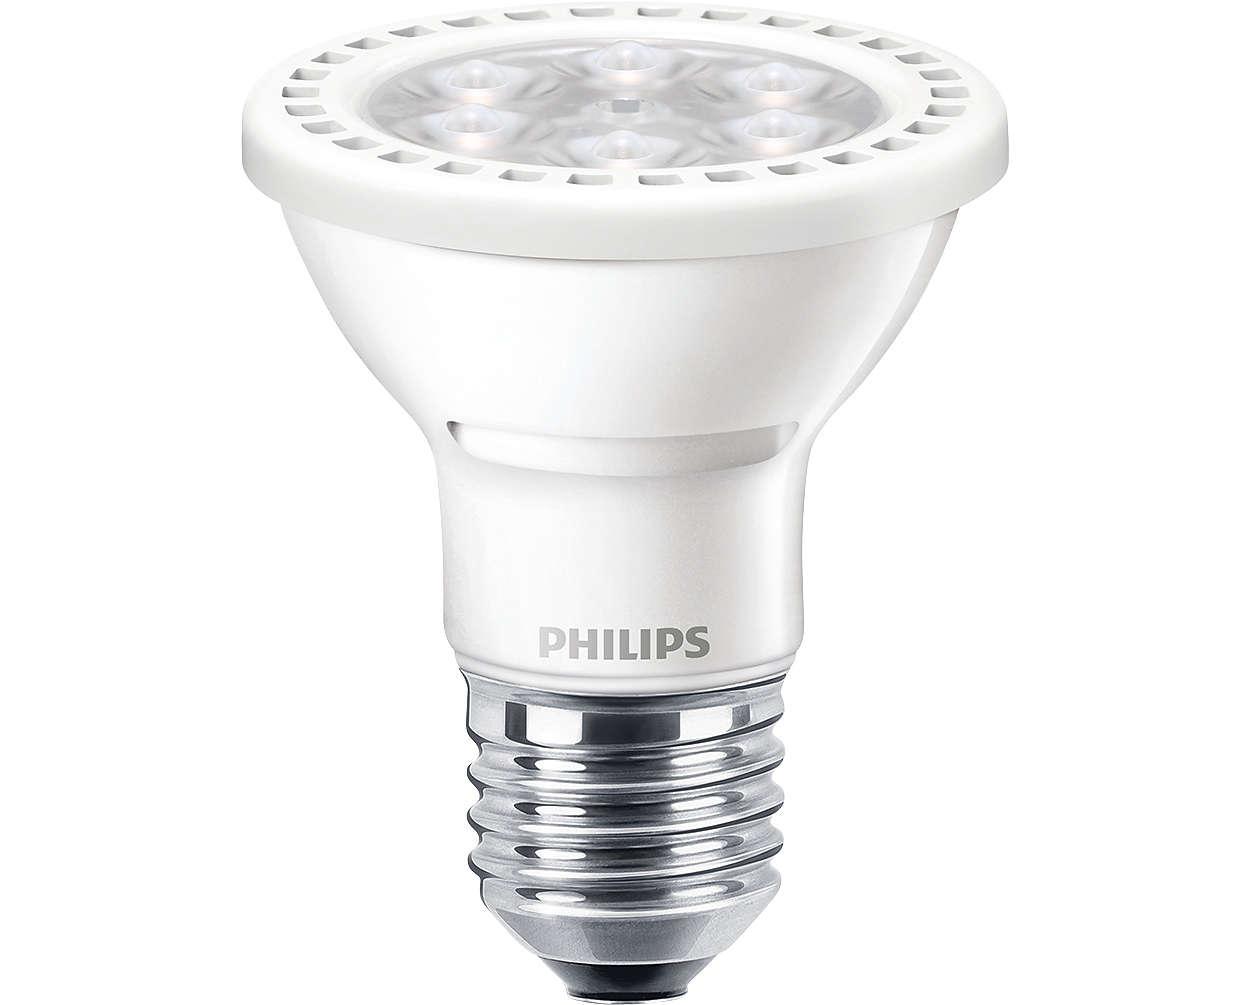 MASTER LEDspot PAR - The energy-saving alternative for lighting in public areas